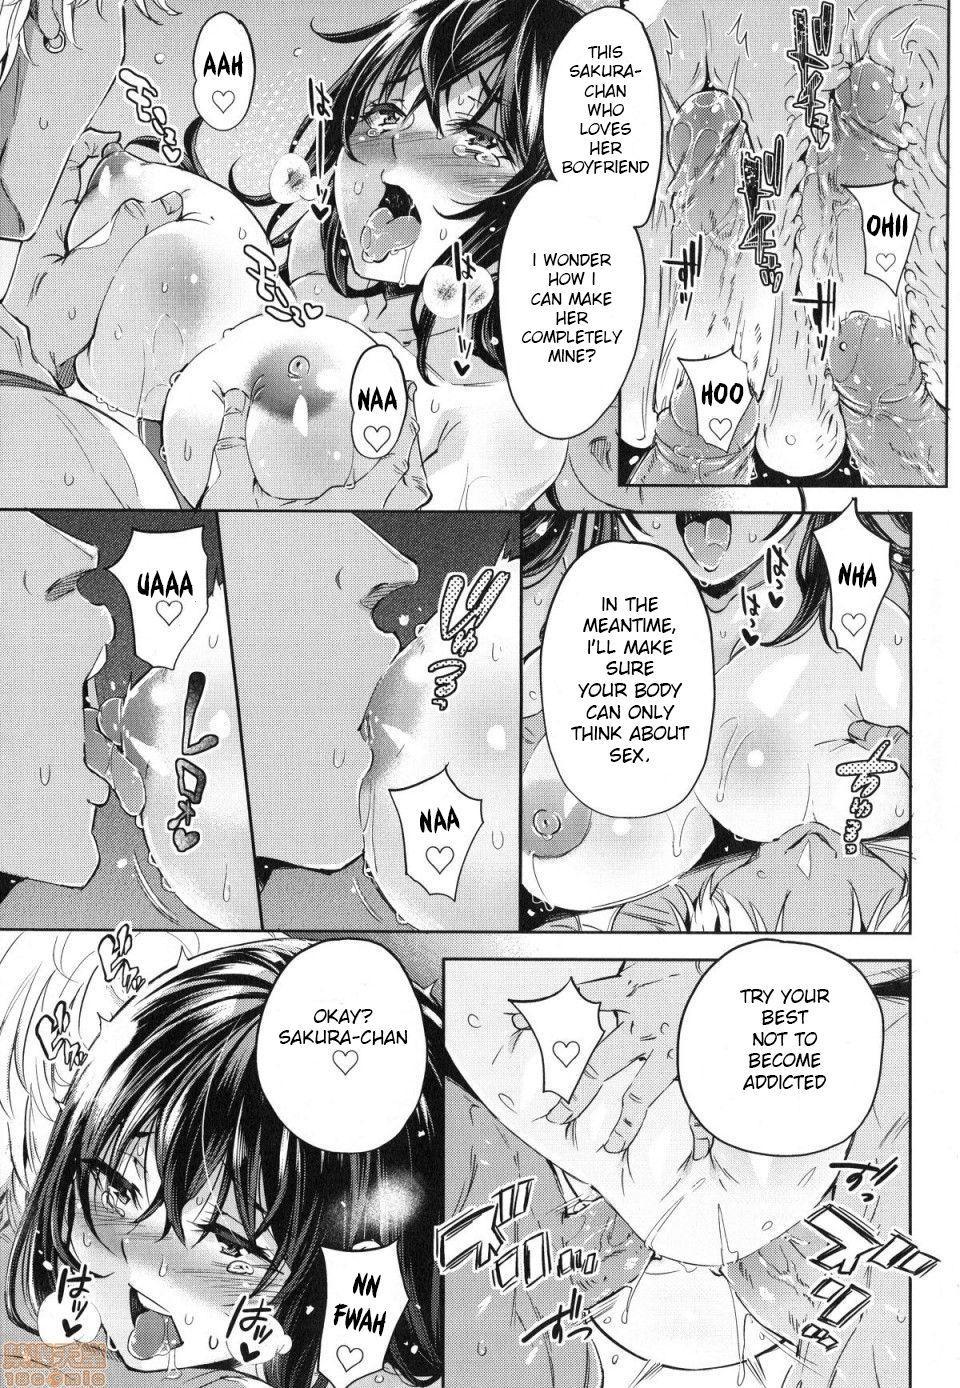 [Musenmai] Gyaru-oh Chinchin ni Katenakatta Kanojo | The Girl Who Couldn't Win Against The Gyaru-oh Dick (Ochinchin ni Makete shimatta Onnanoko-tachi) [English] [Decensored] 20